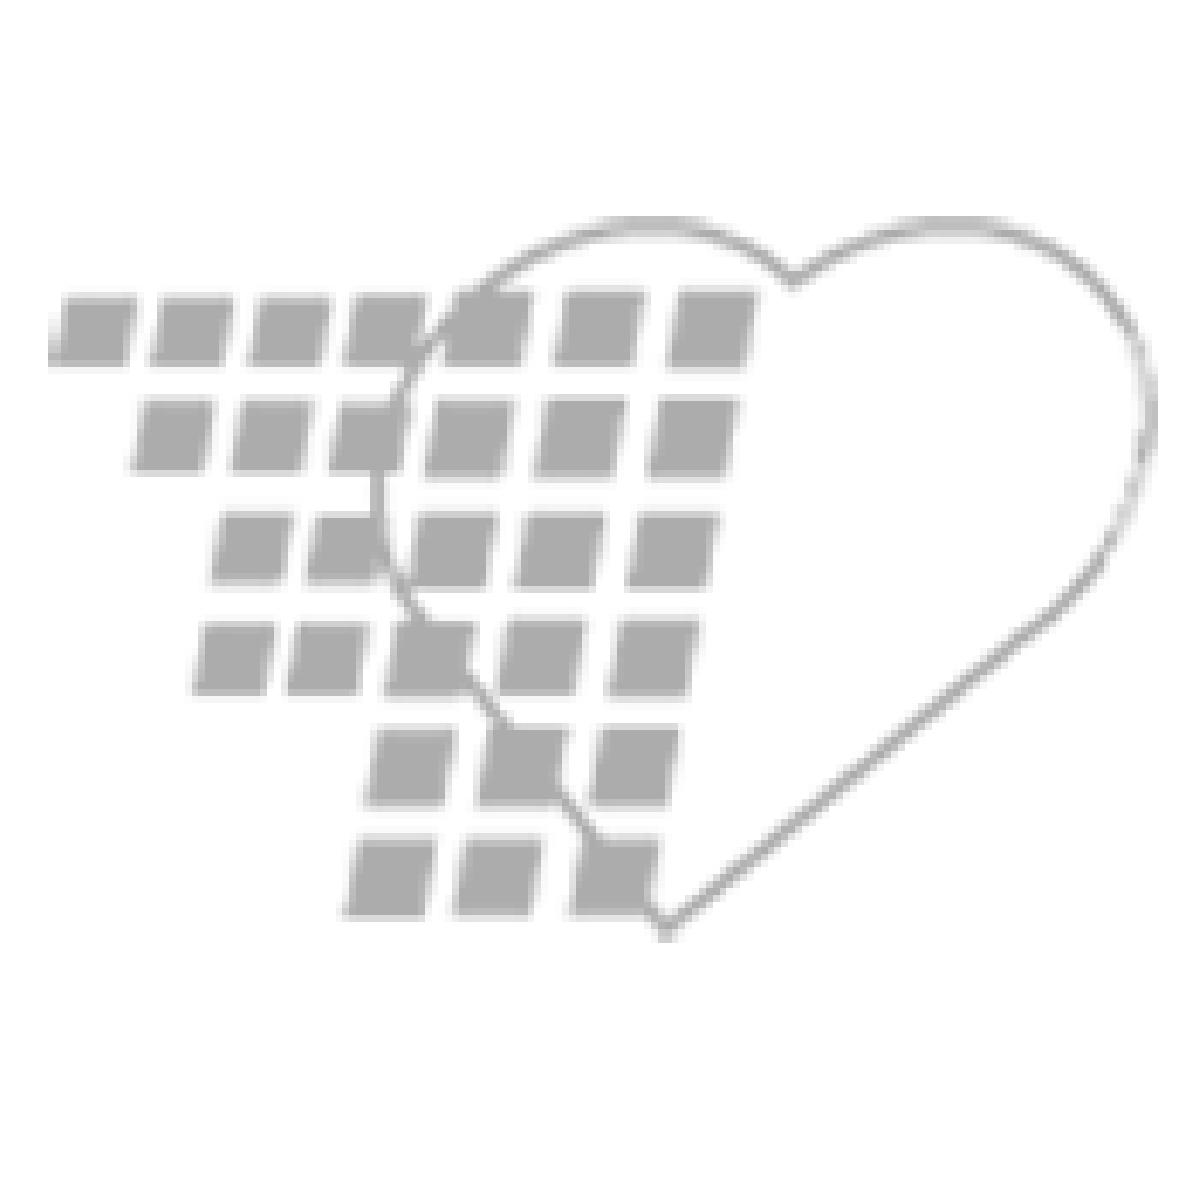 07-26-4114 BD® Cardinal Rigid Basin Kits with Saline - 14 Fr